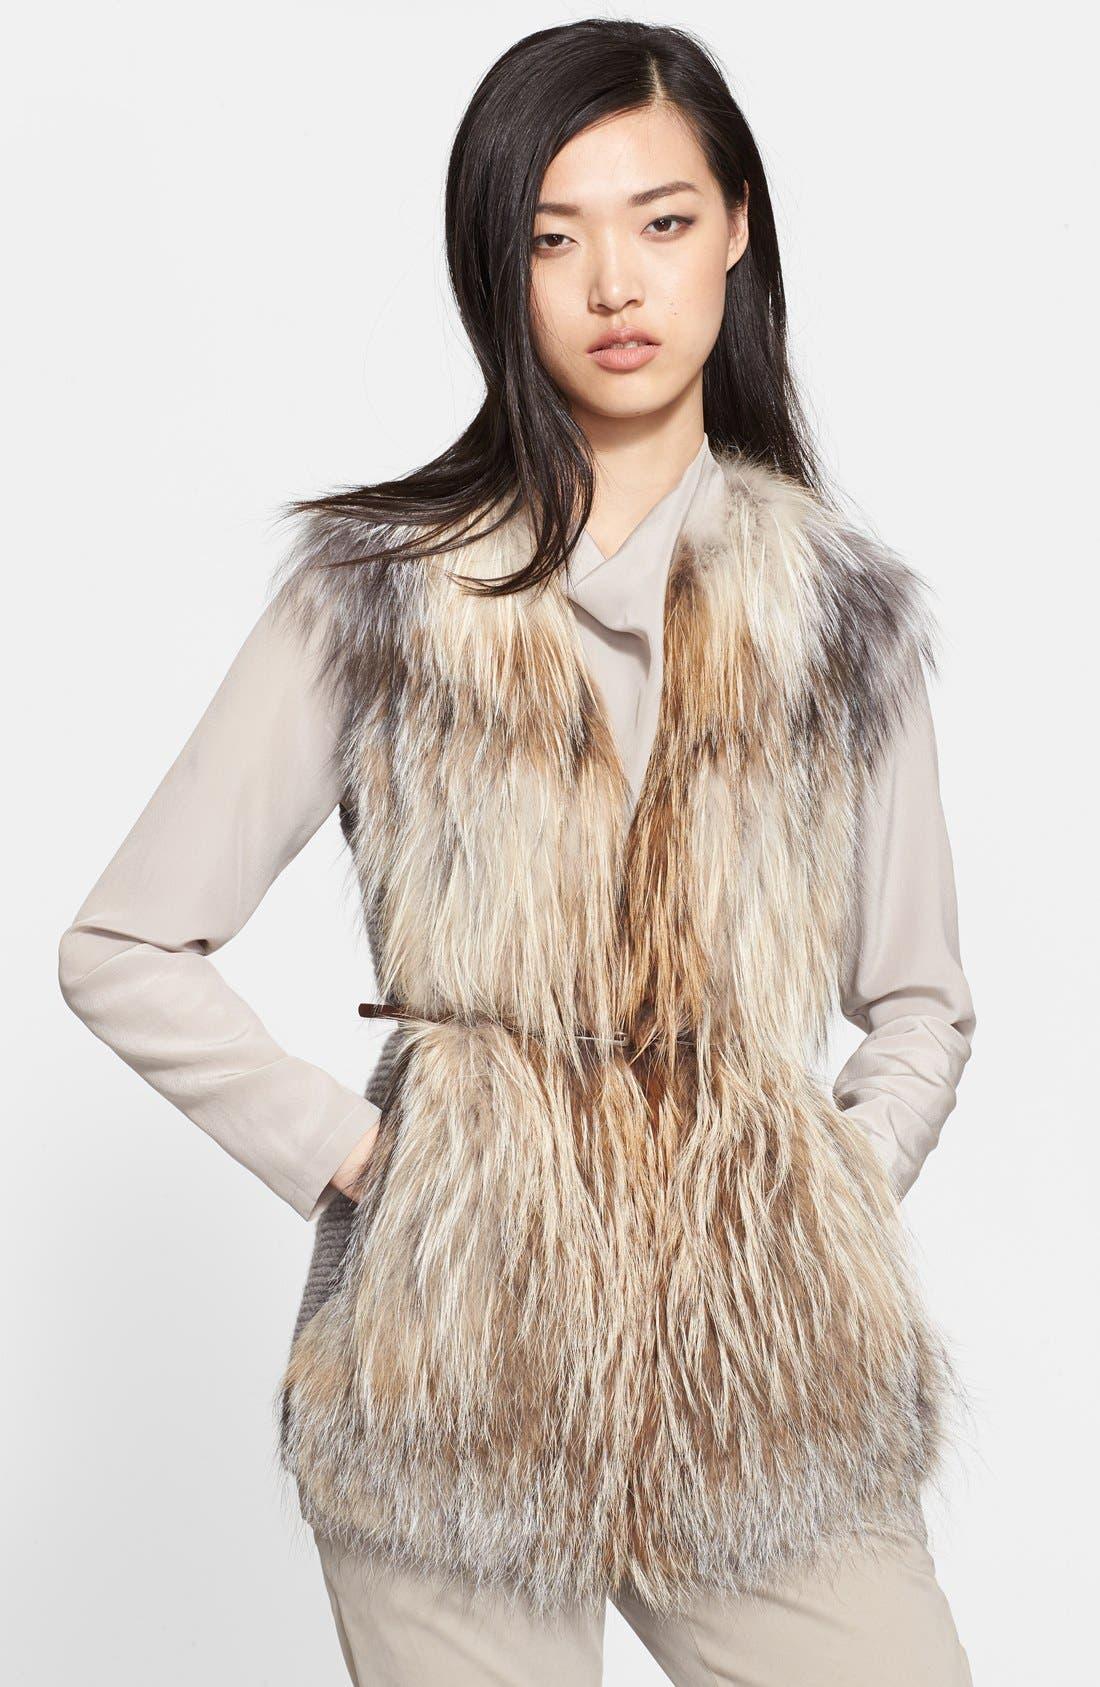 Main Image - Fabiana Filippi Genuine Fox Fur Sweater Vest with Leather Belt